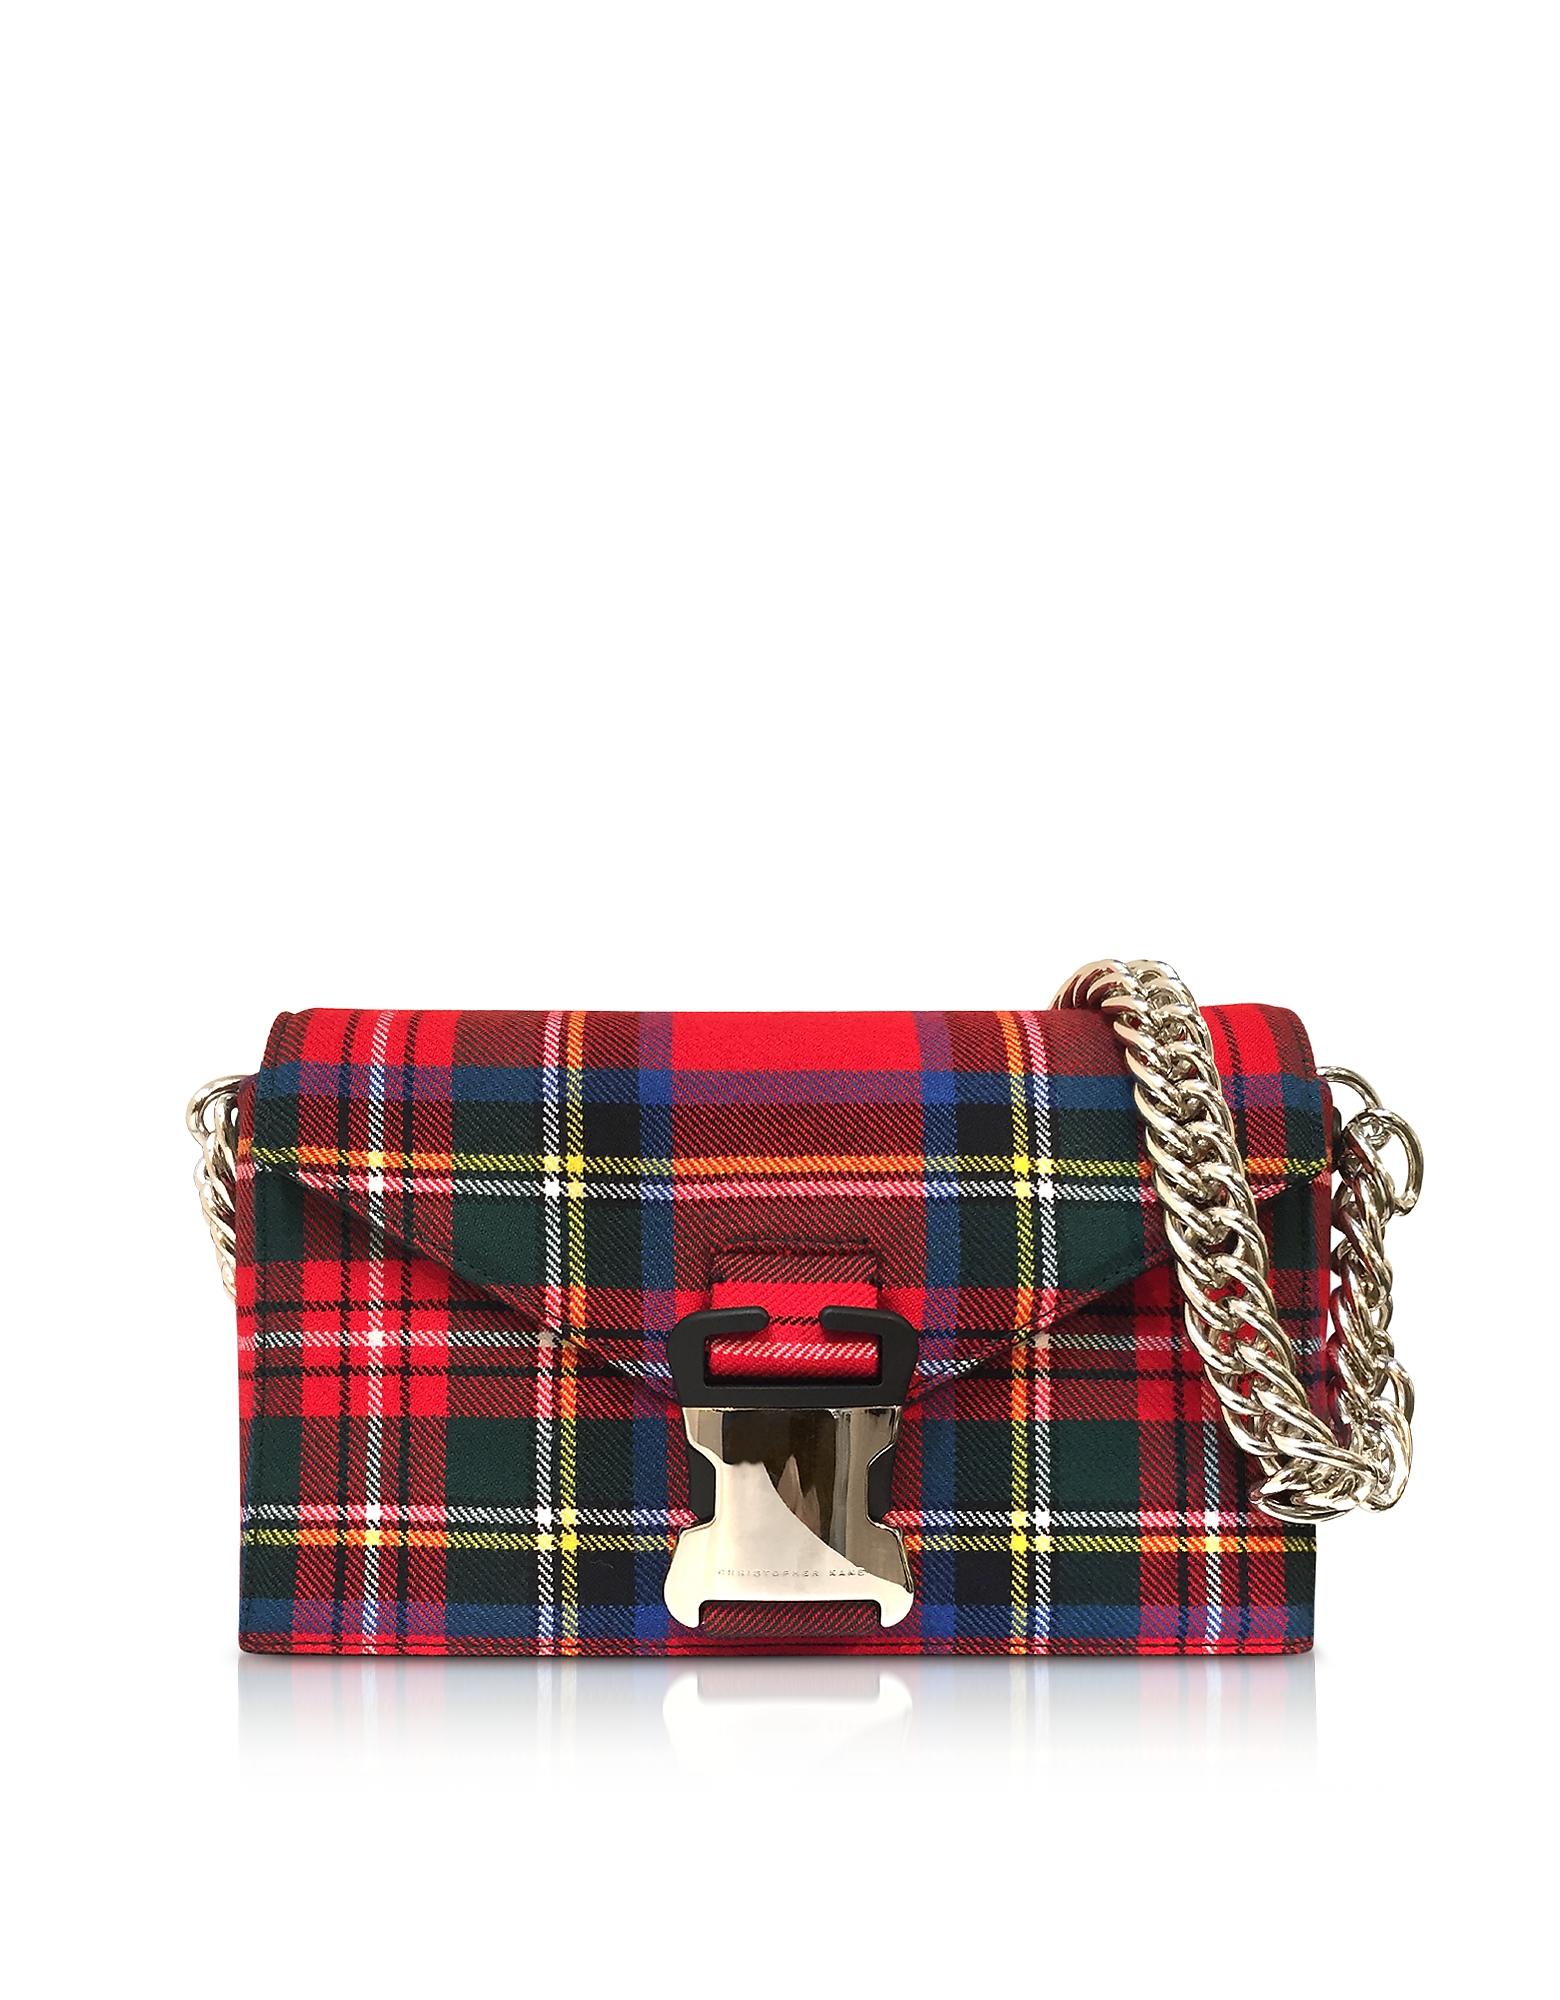 Christopher Kane Handbags, Mars Red Tartan Small Devine Bag